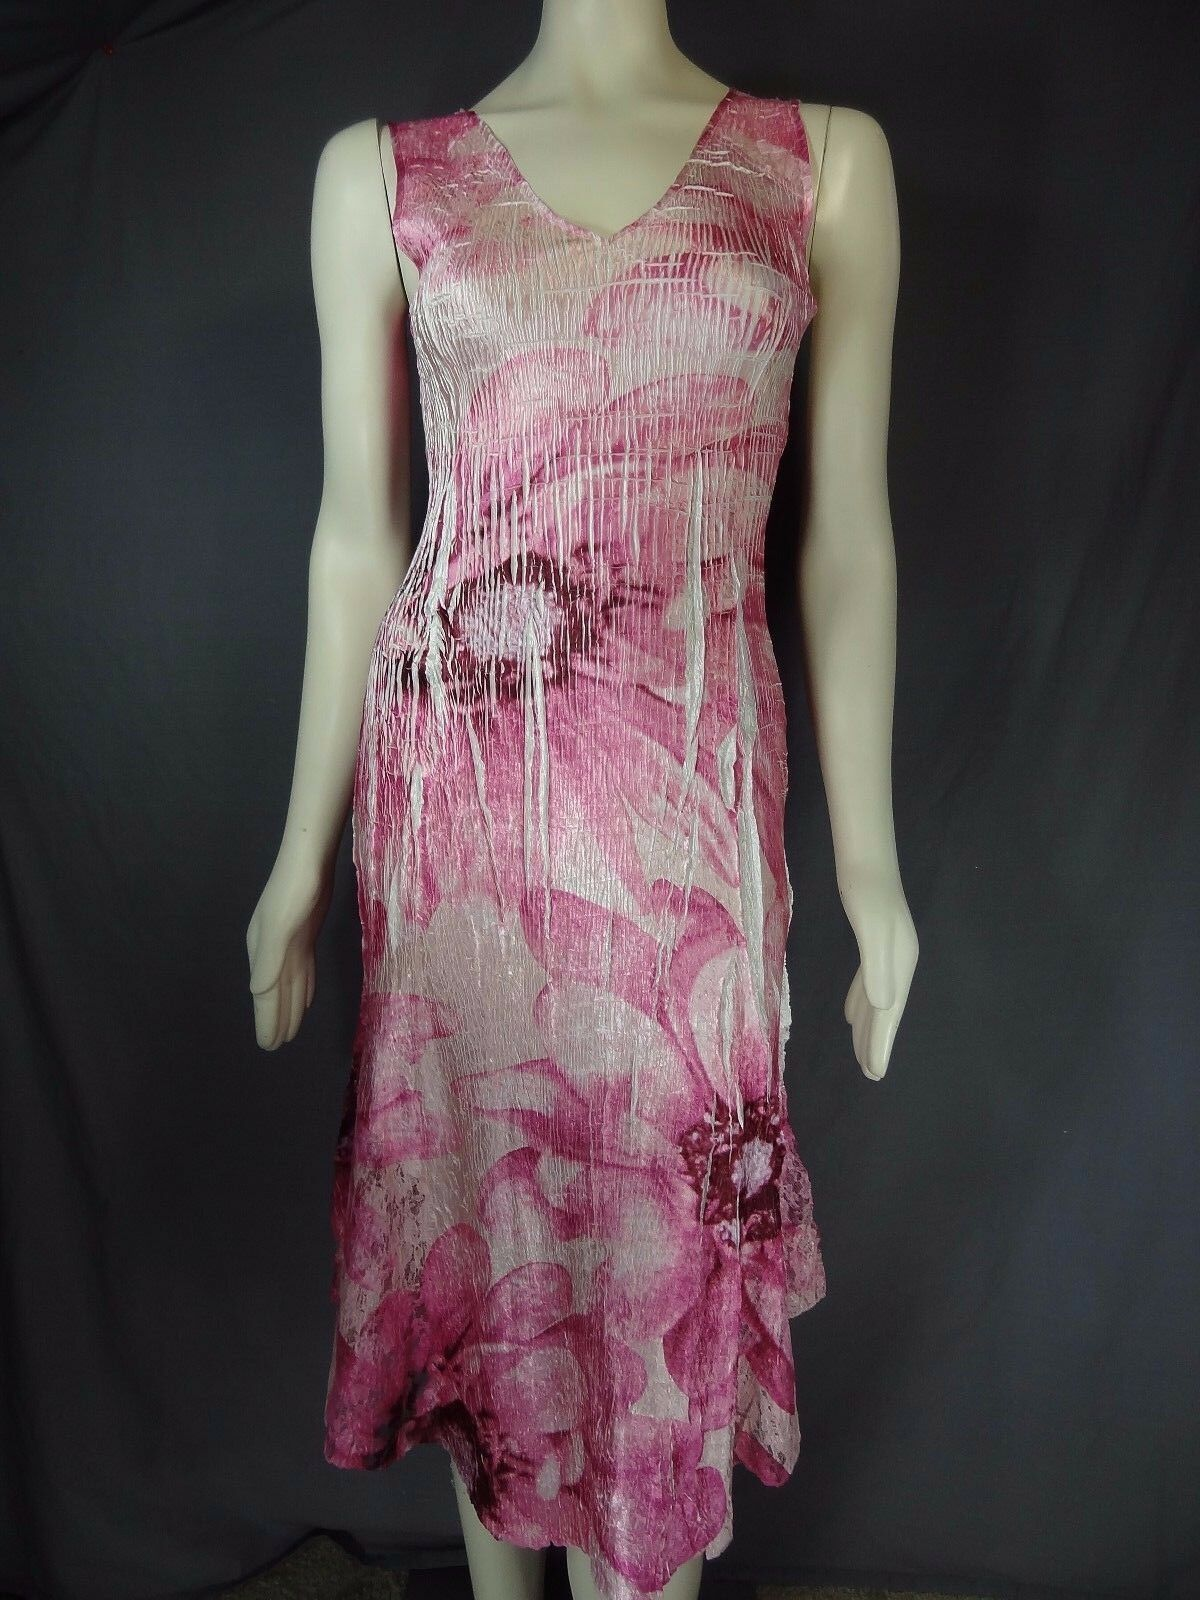 Komarov Dress Sleeveless Pink Floral Lace Trim Knee length  Dress size S